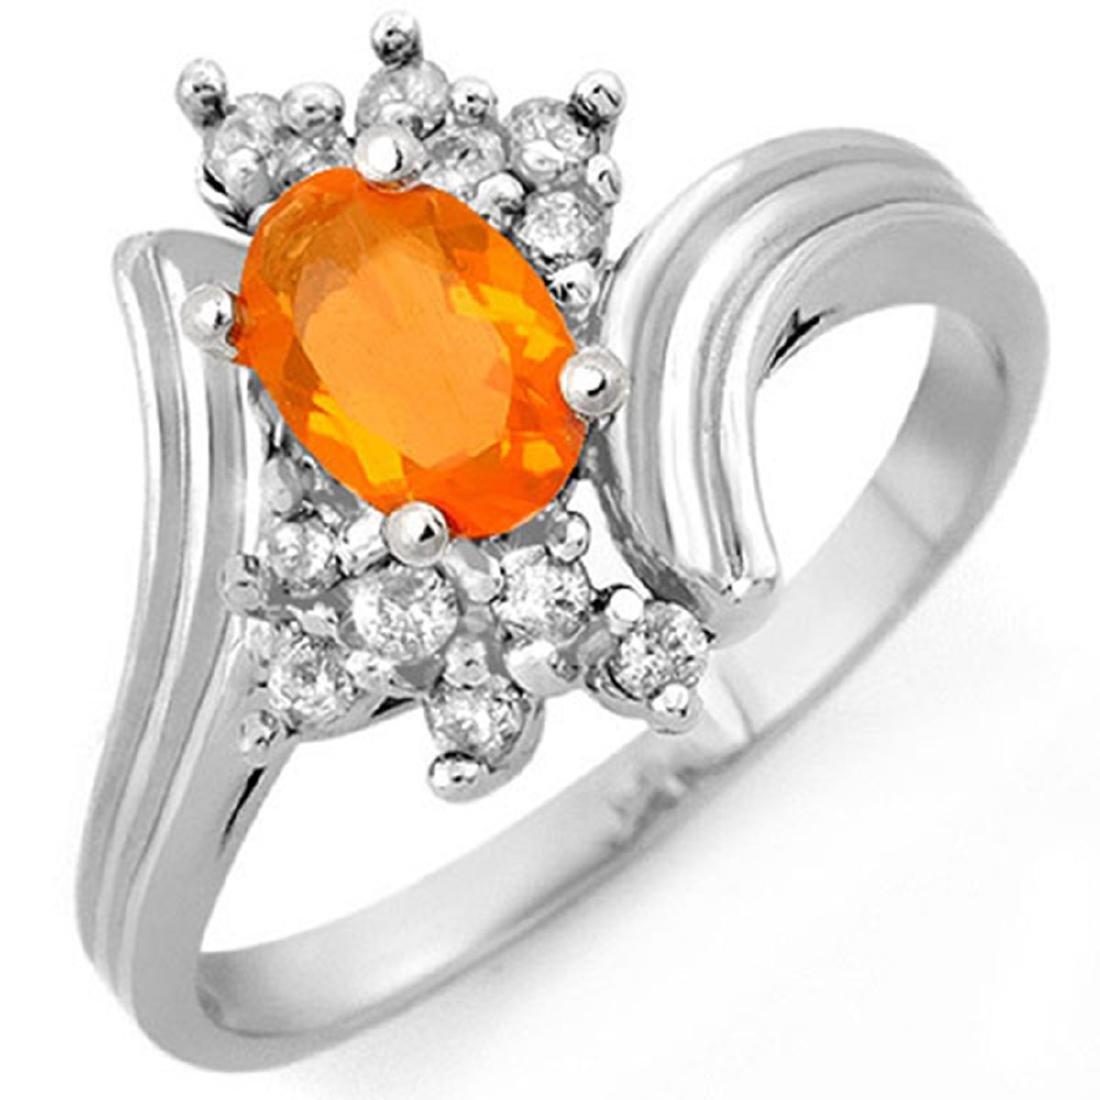 0.65 CTW Opal & Diamond Ring 10K White Gold